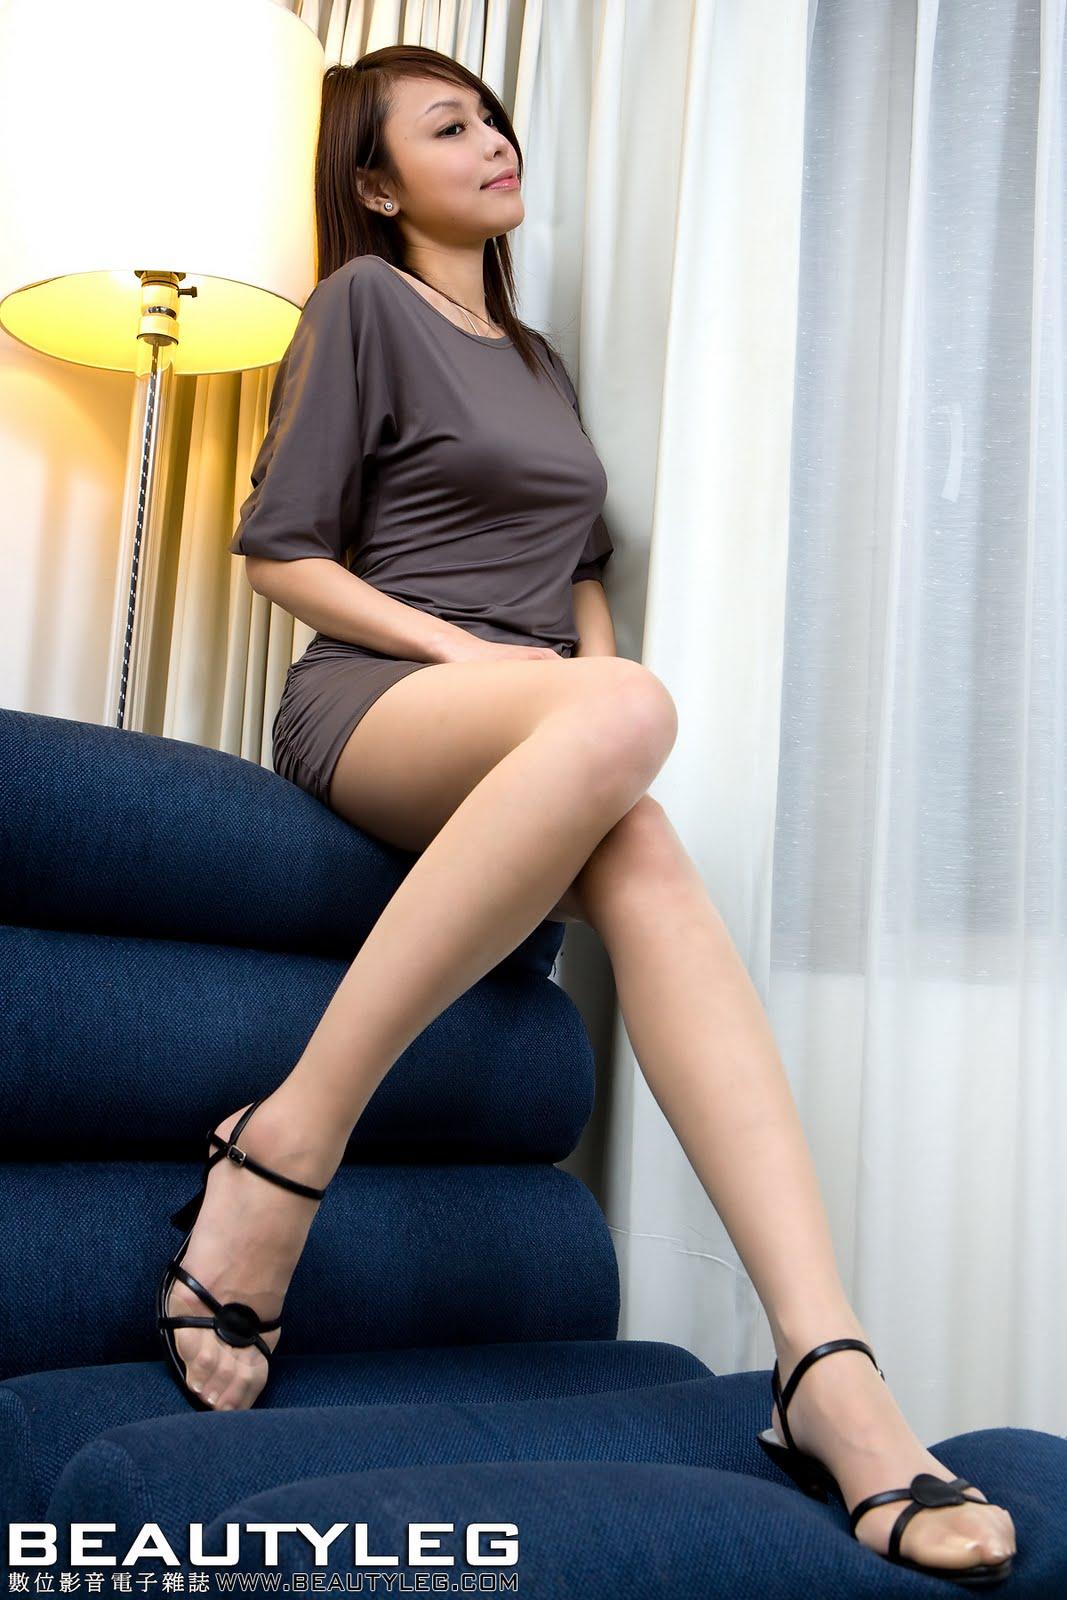 http://3.bp.blogspot.com/_mL74gvvafpo/TFrqw8pbylI/AAAAAAAABU8/hWqfw5ncvOE/s1600/eva+chinese+girl01.jpg